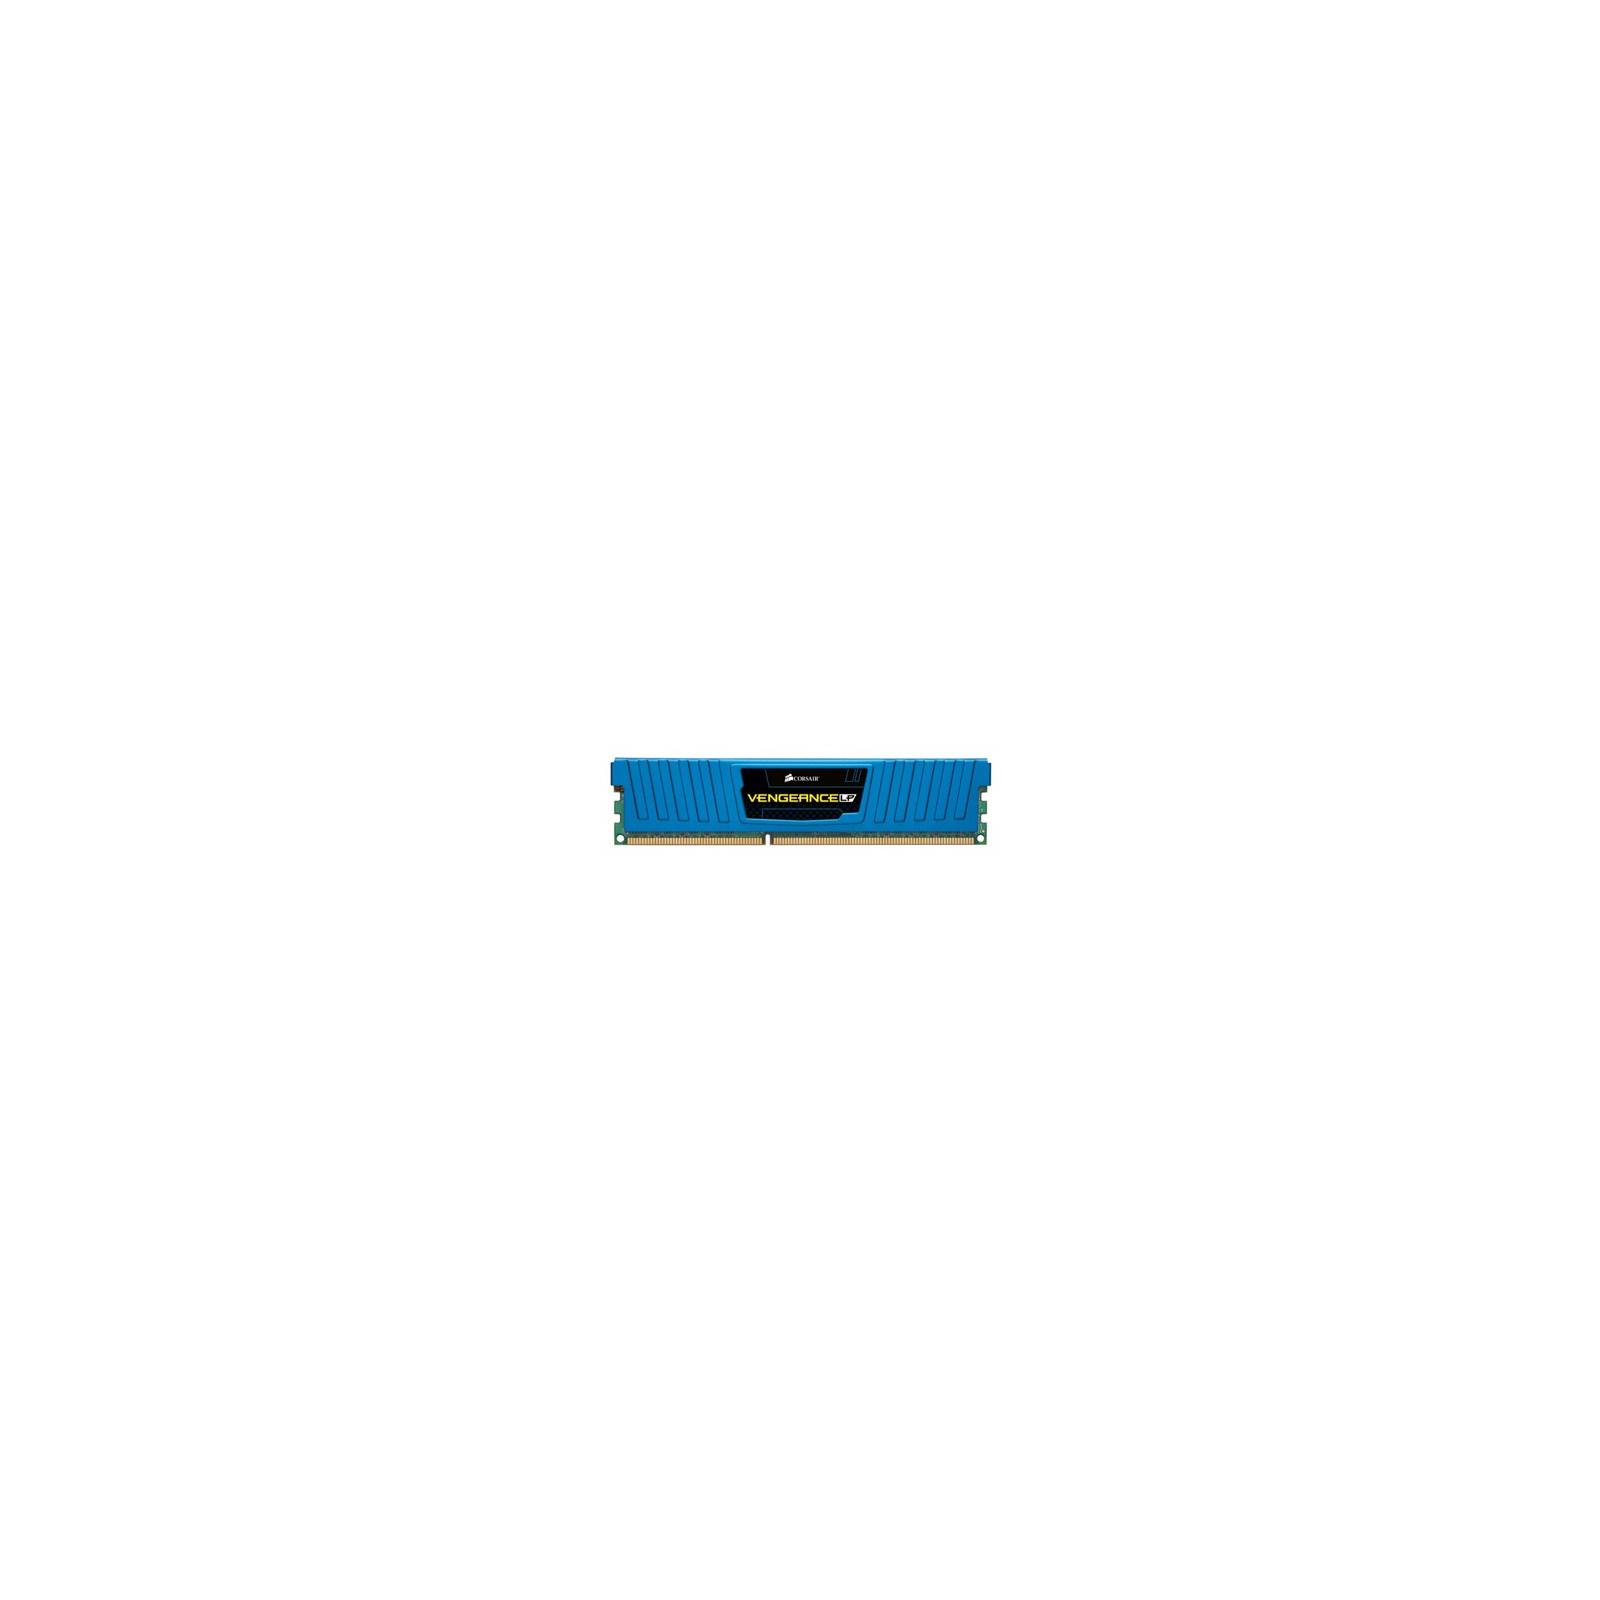 Модуль памяти для компьютера DDR3 8GB 1600 MHz CORSAIR (CML8GX3M1A1600C10B)